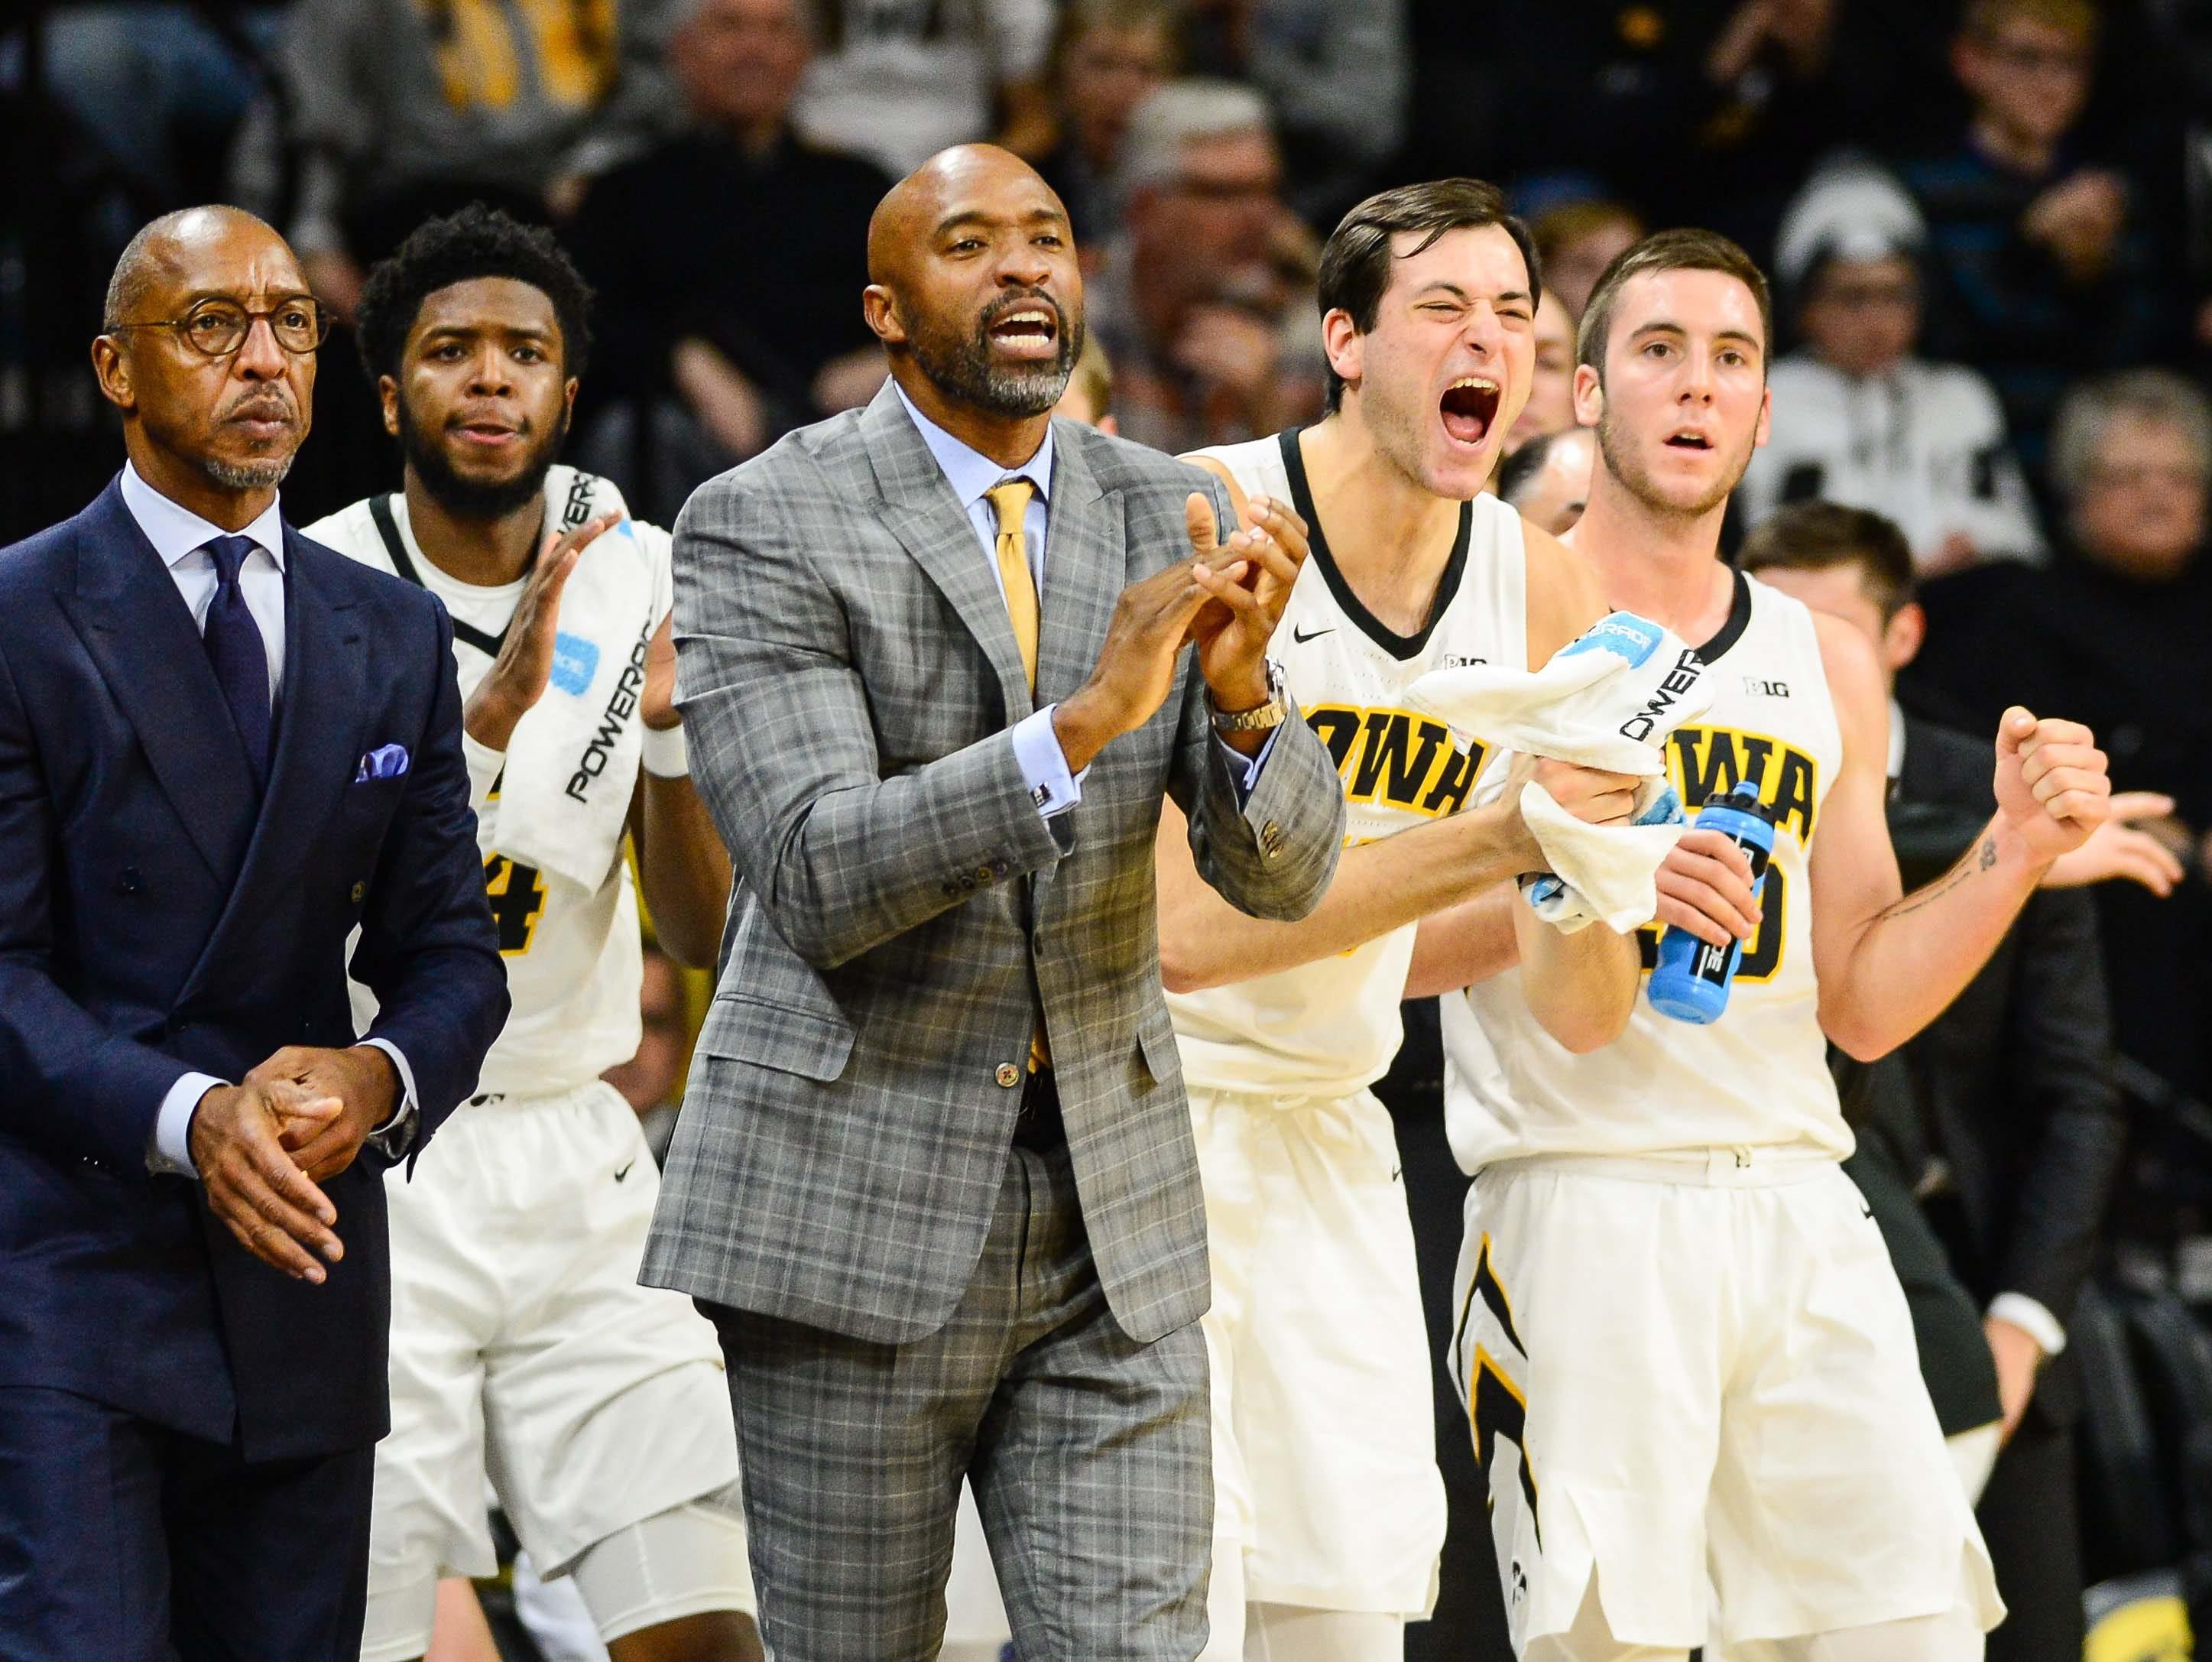 Usp Ncaa Basketball Pittsburgh At Iowa S Bkc Iow Pit Usa Ia